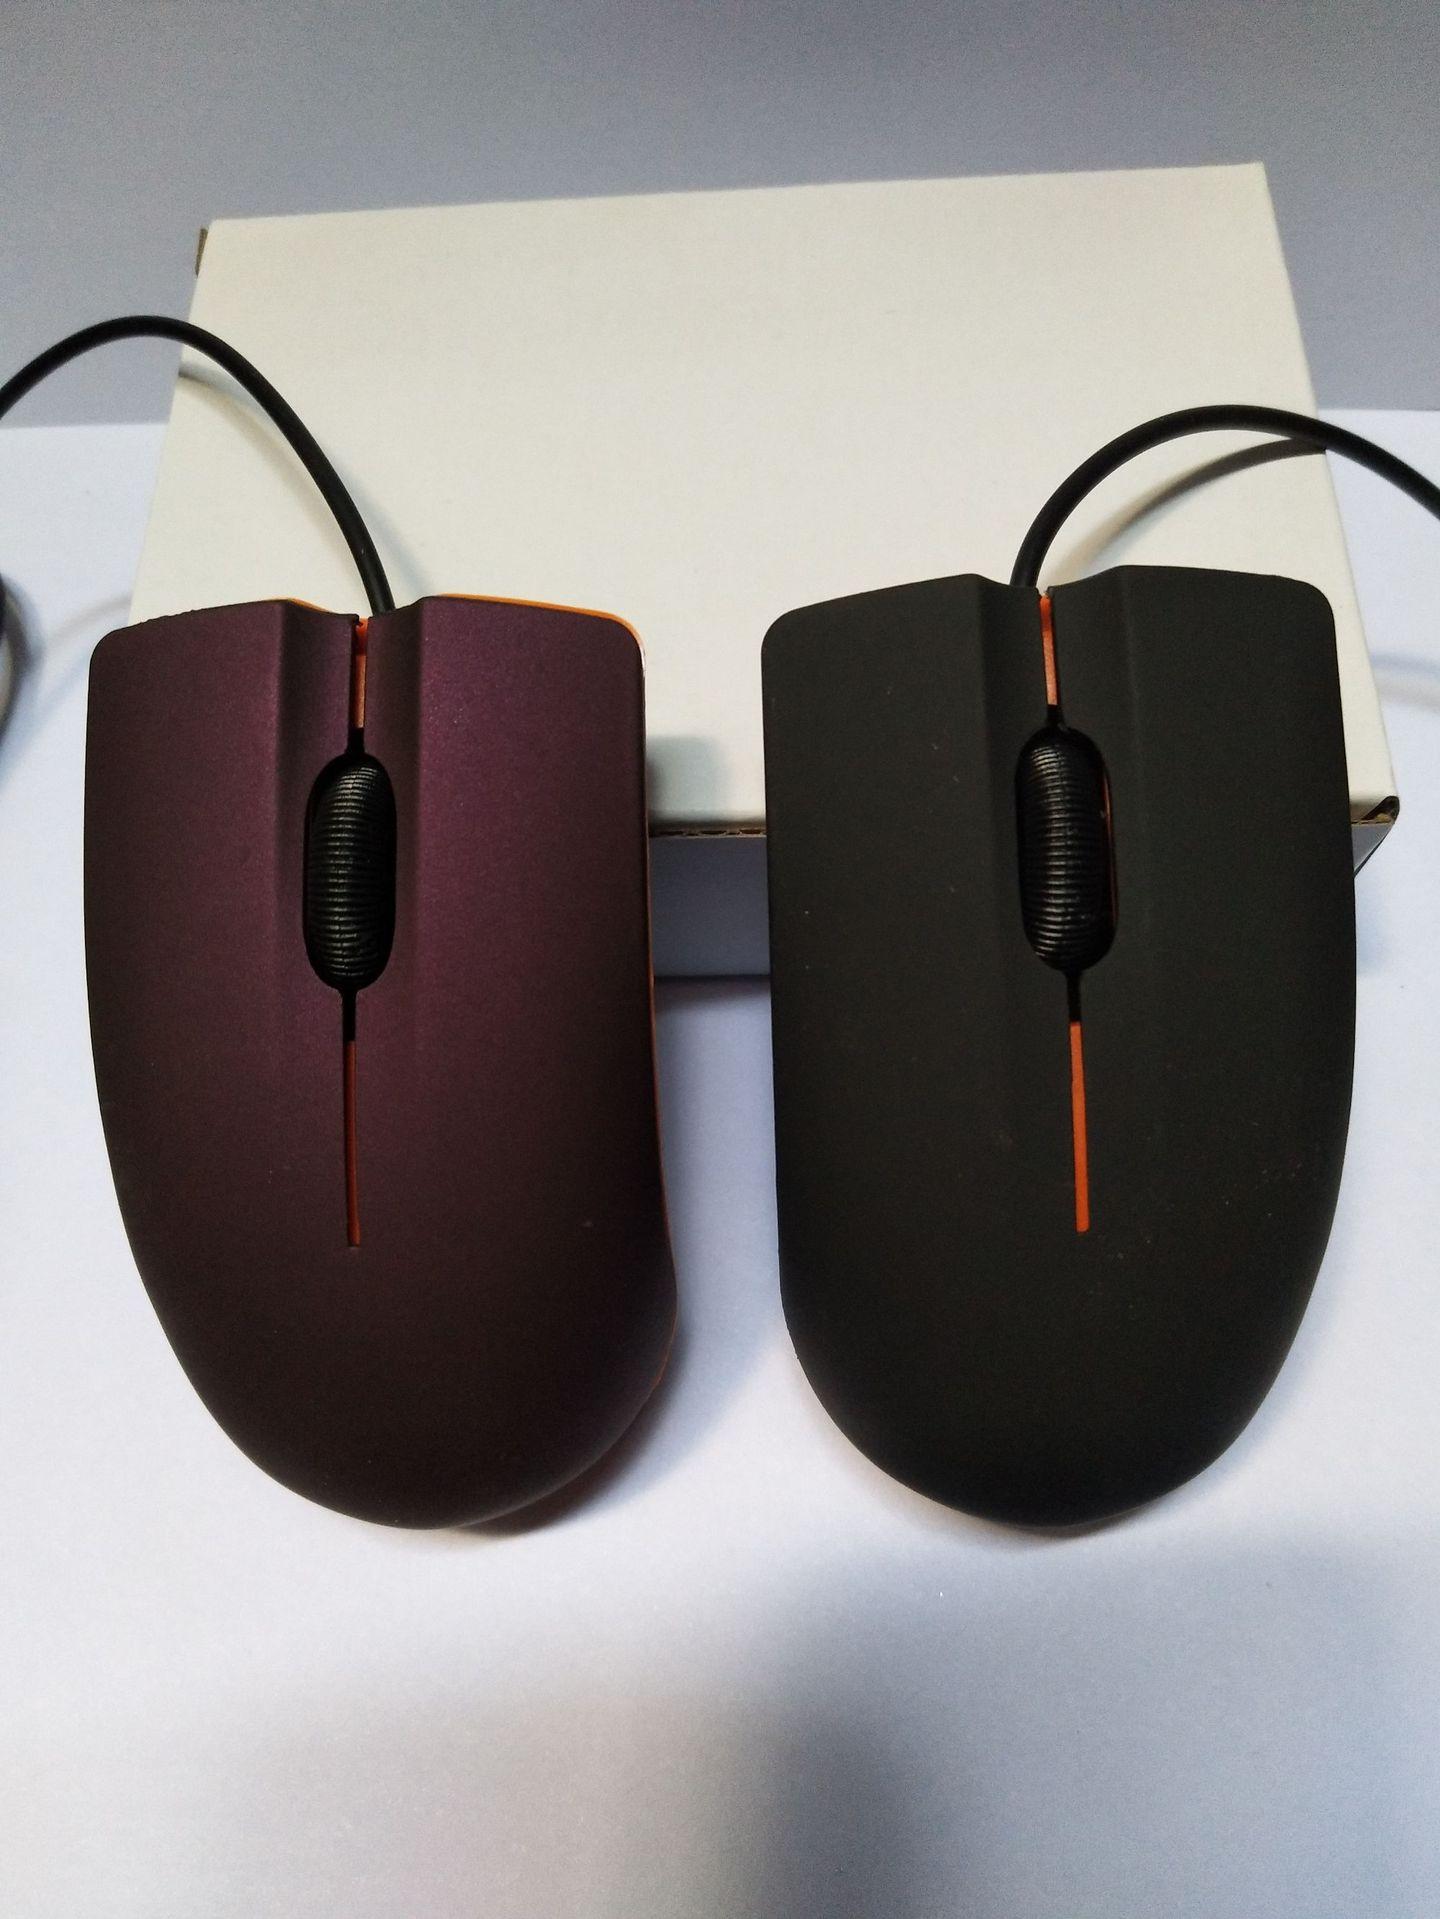 Mouse M20 Mouse Cable Notebook Mini Mouse Desktop Computer Game USB Mouse